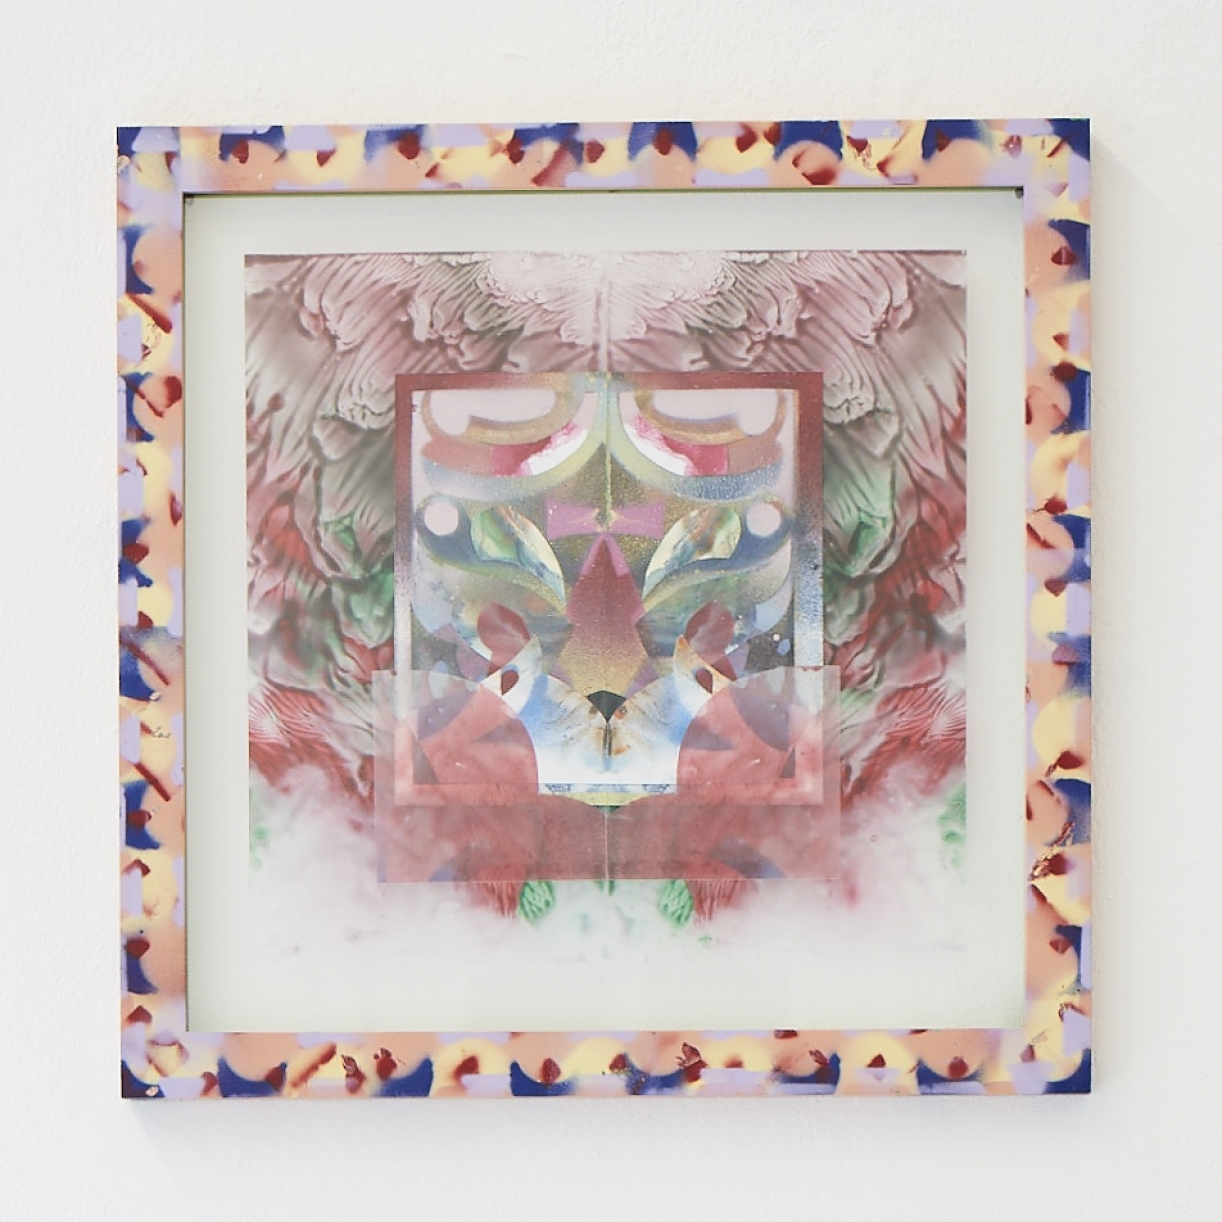 Moritz Altmann, eda, 2017, mixed media on paper and transparency, sprayed frame, 40,5 x 40,5 cm